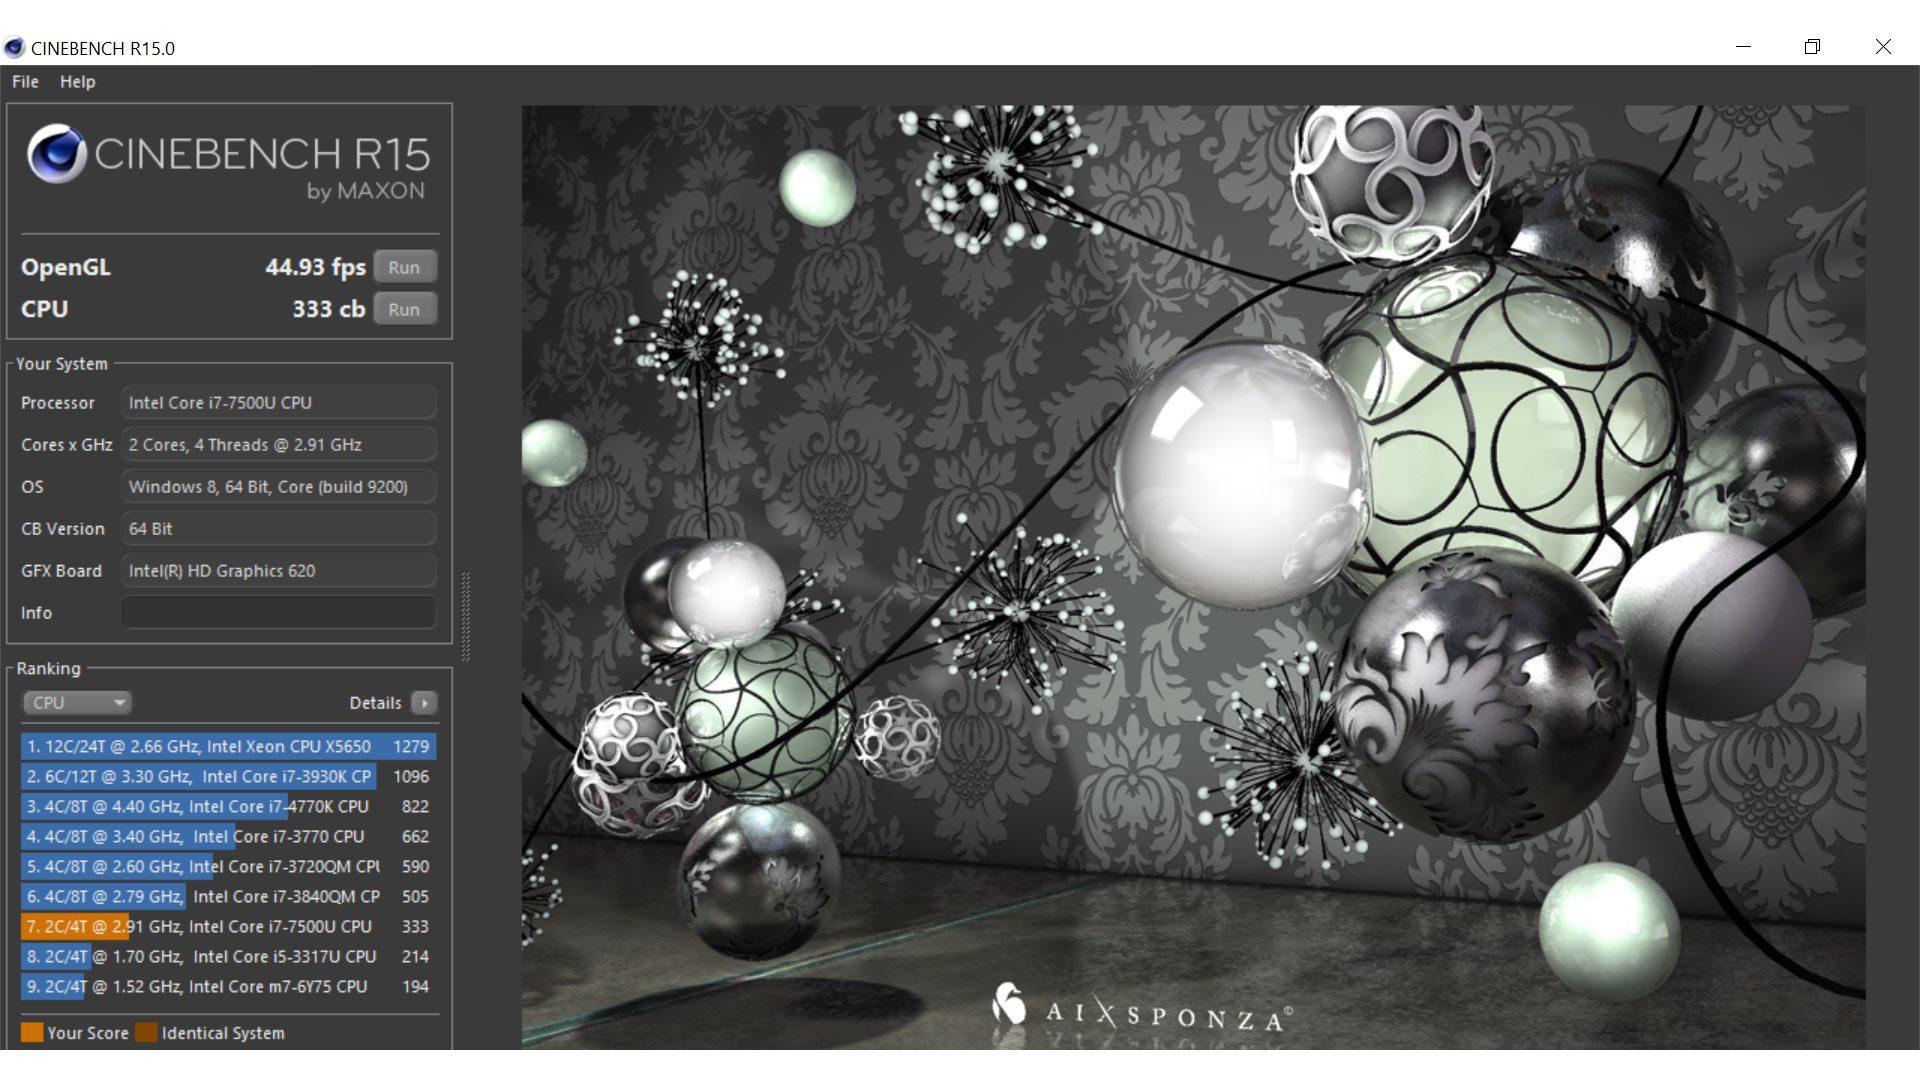 HP-Spectre-x360-13-ac002ng_Benchmark-8